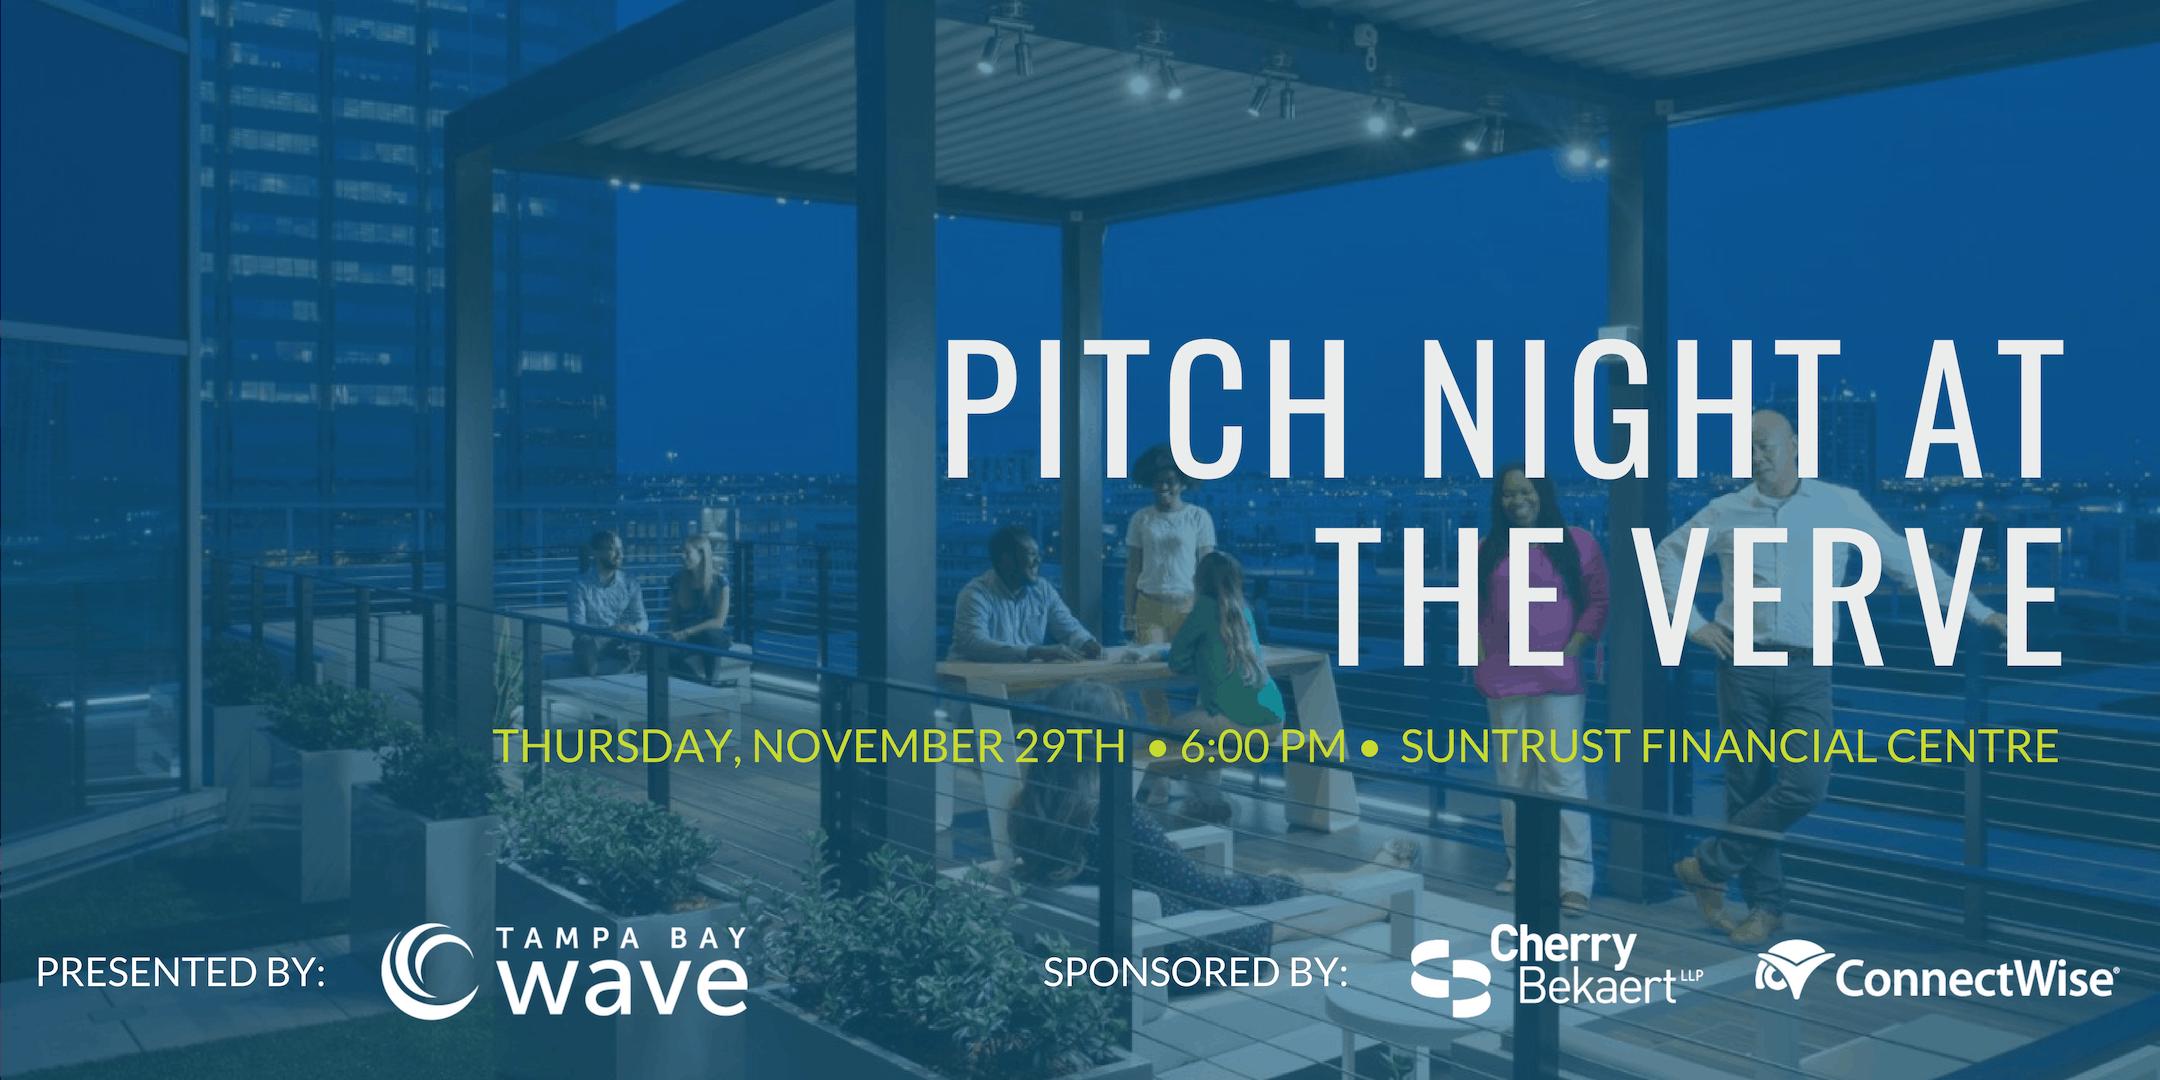 Tampa Bay Wave - Pitch Night at The Verve Lounge - Suntrust